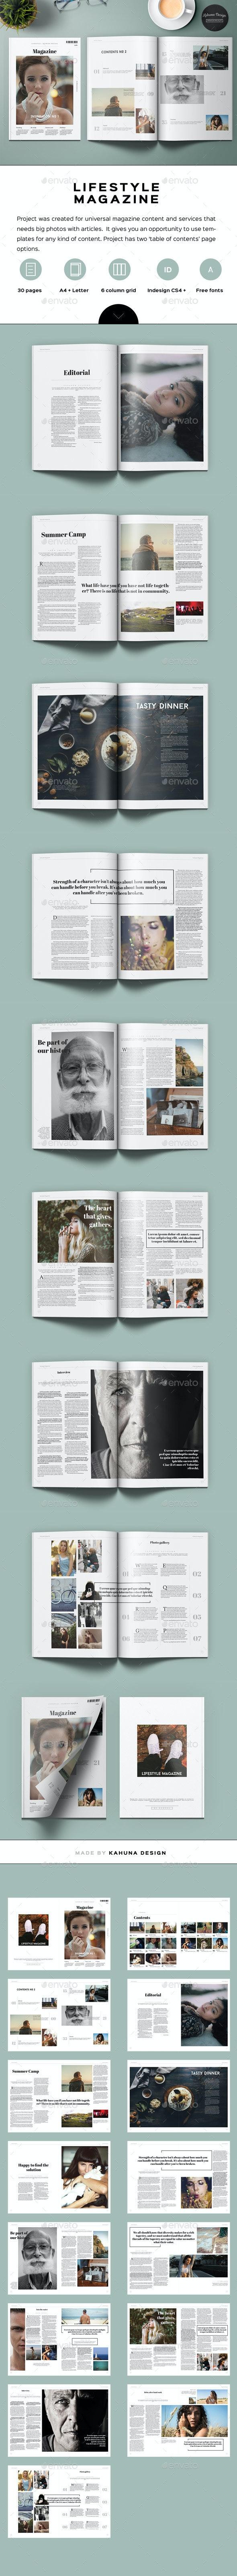 Lifestyle Universal Magazine - Magazines Print Templates